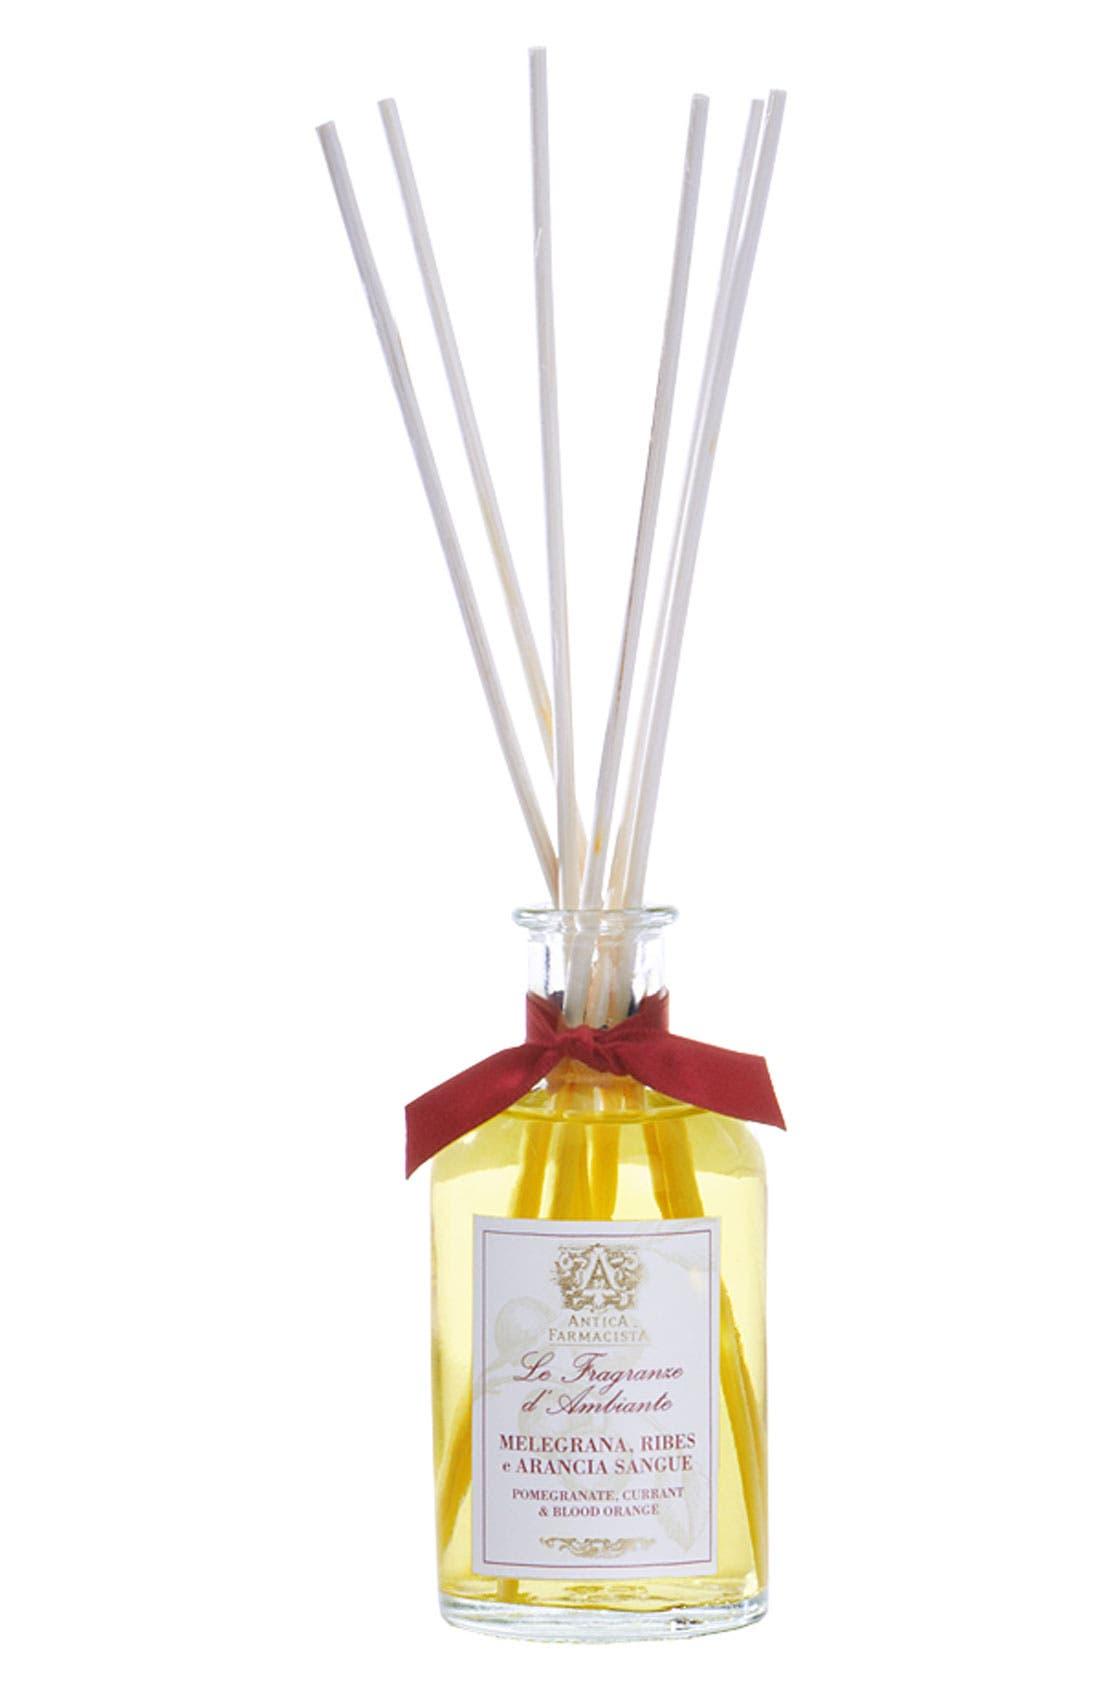 Pomegranate, Currant & Blood Orange Home Ambiance Perfume,                         Main,                         color, No Color